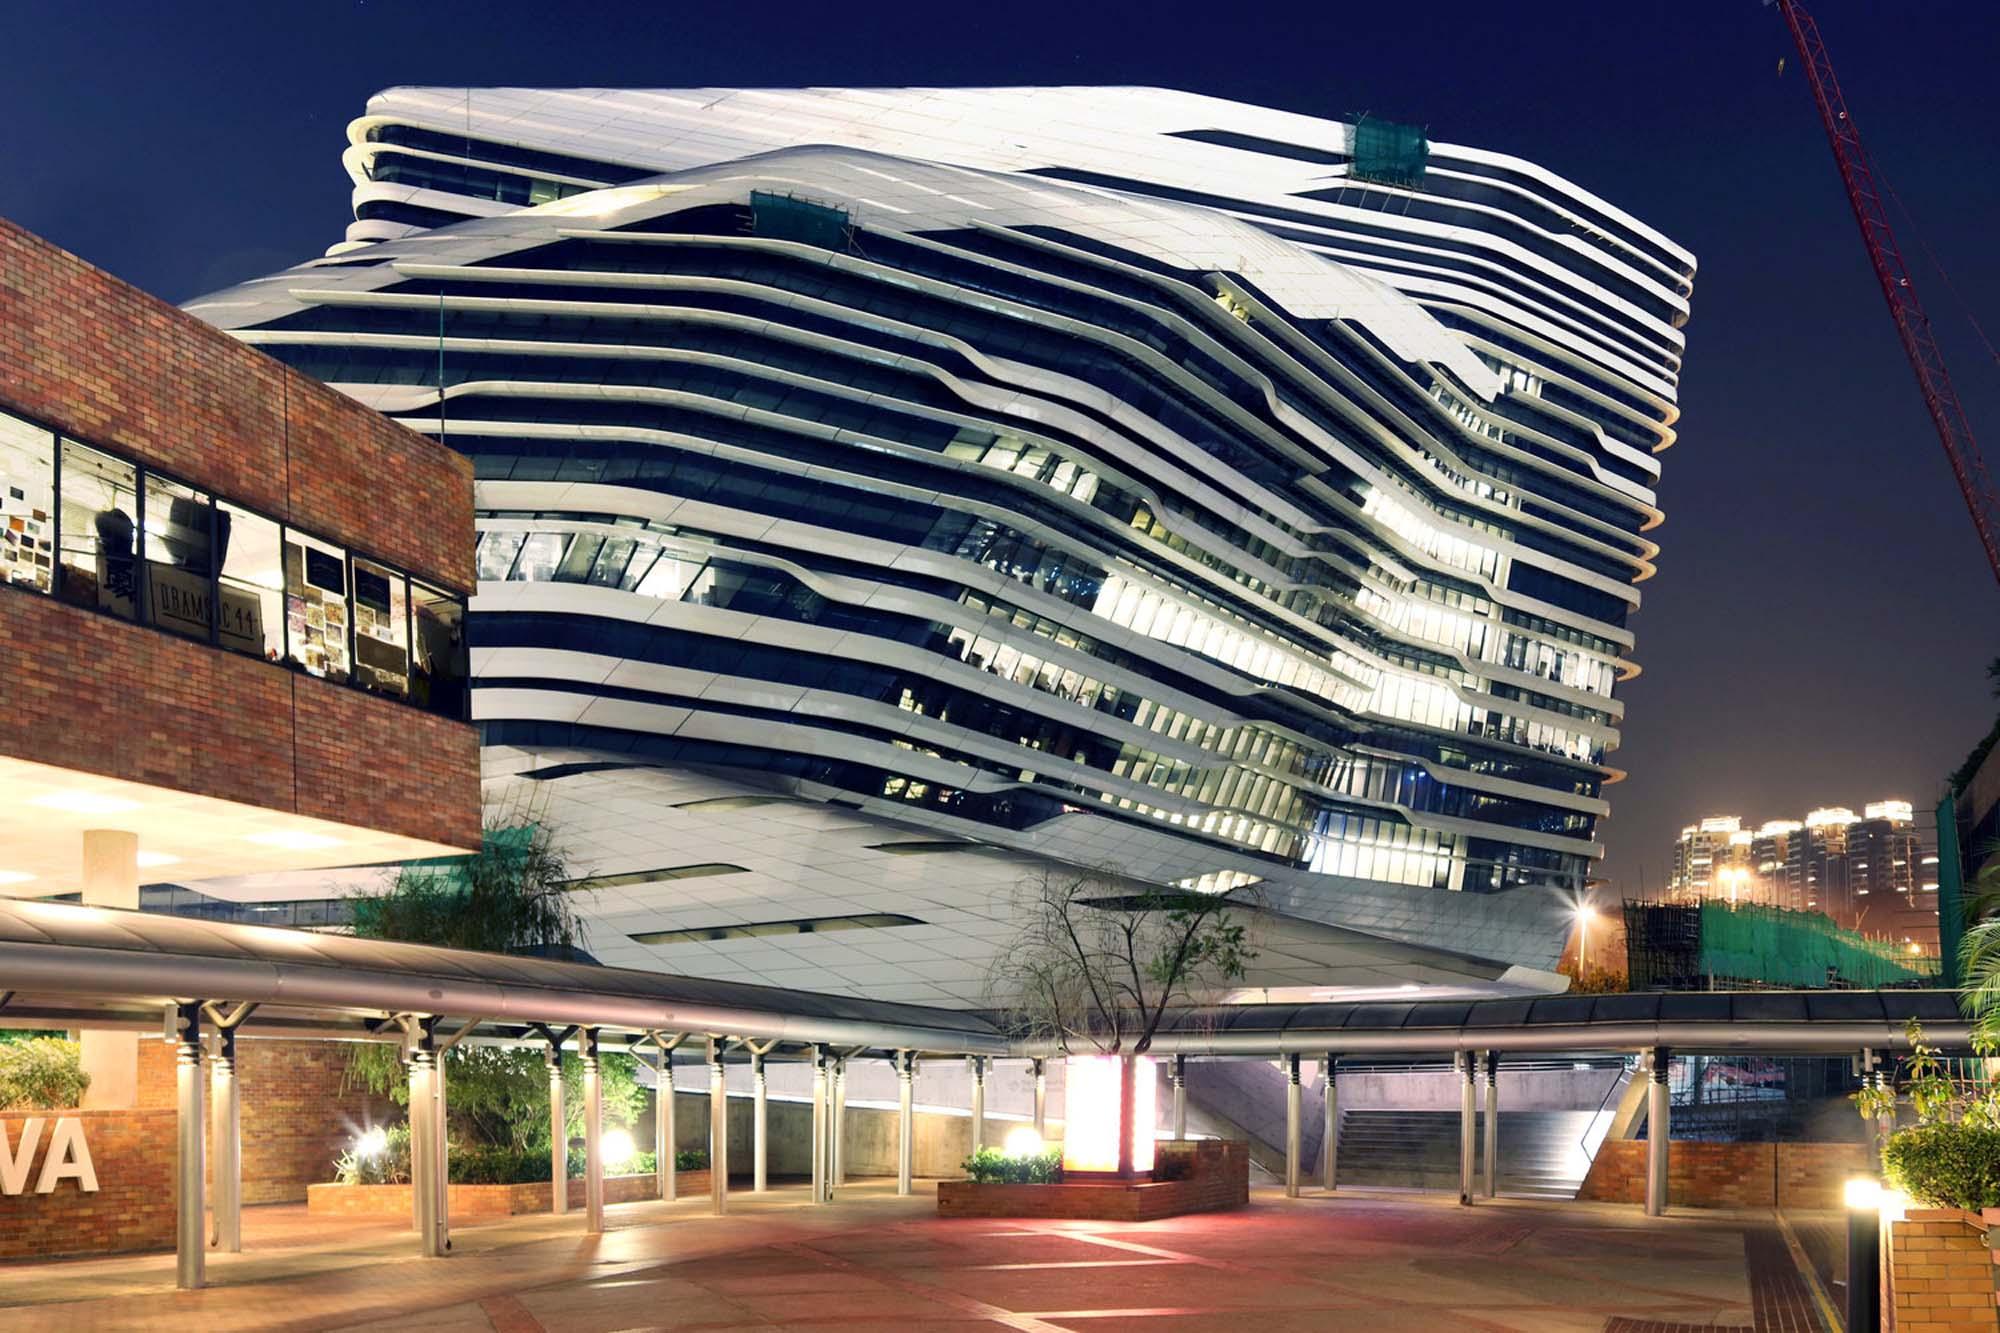 Jockey Club Innovation Tower by Zaha Hadid